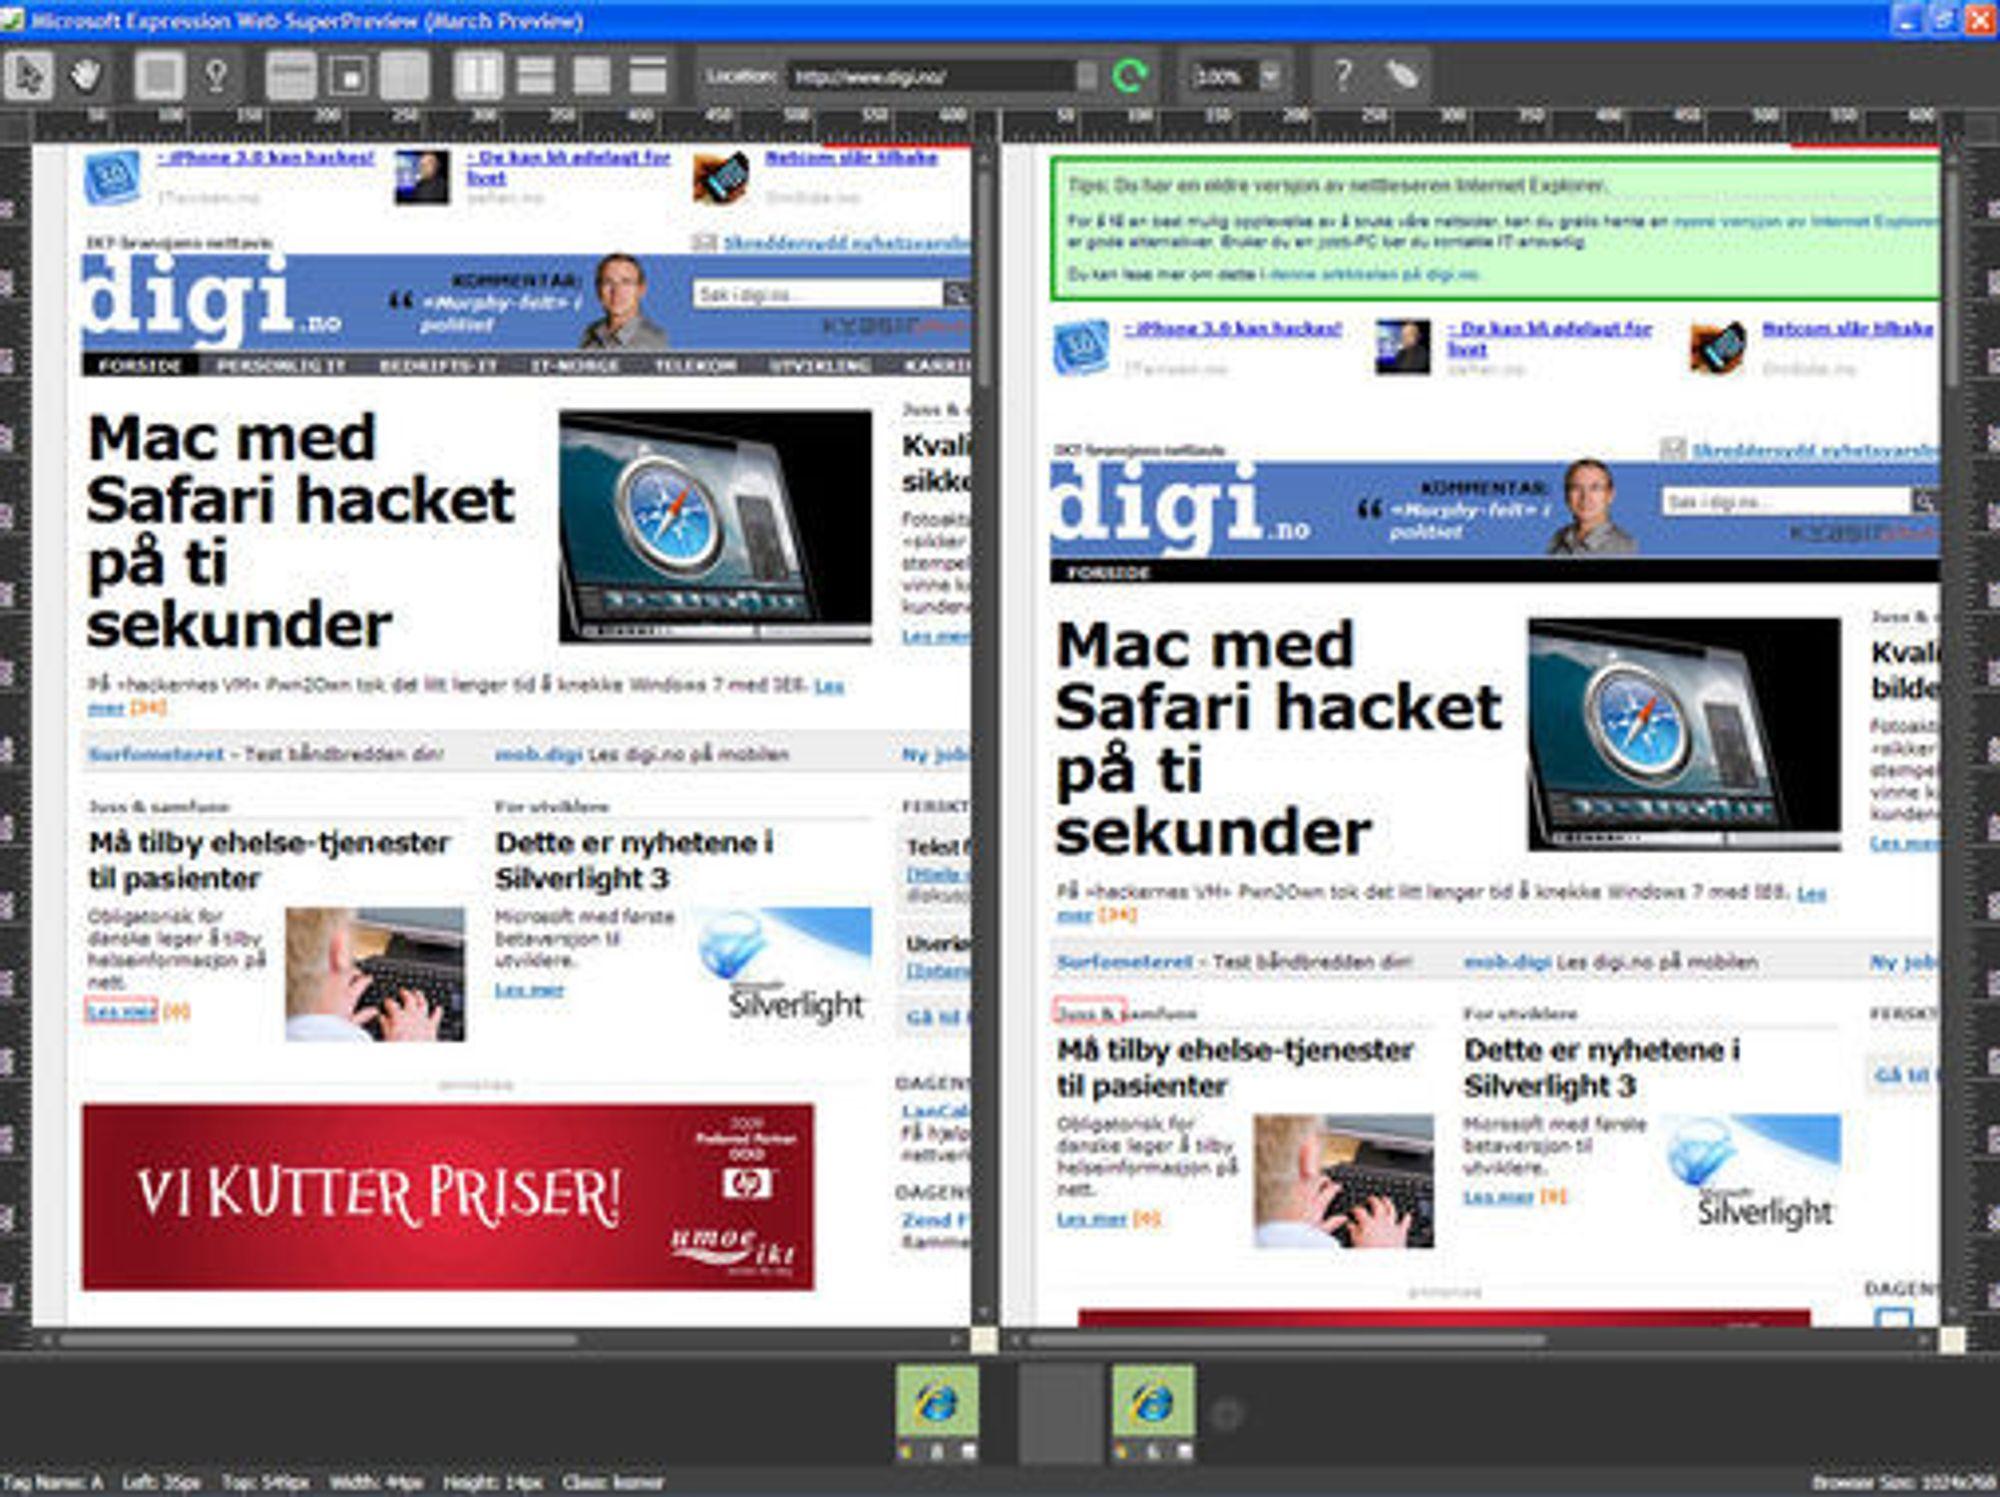 digi.no vises i Expression Web SuperPreview i IE8 og IE6 side ved side. I IE6-visningen til høyre er oppfordringen til å oppgradere til en nyere nettleser, godt synlig.